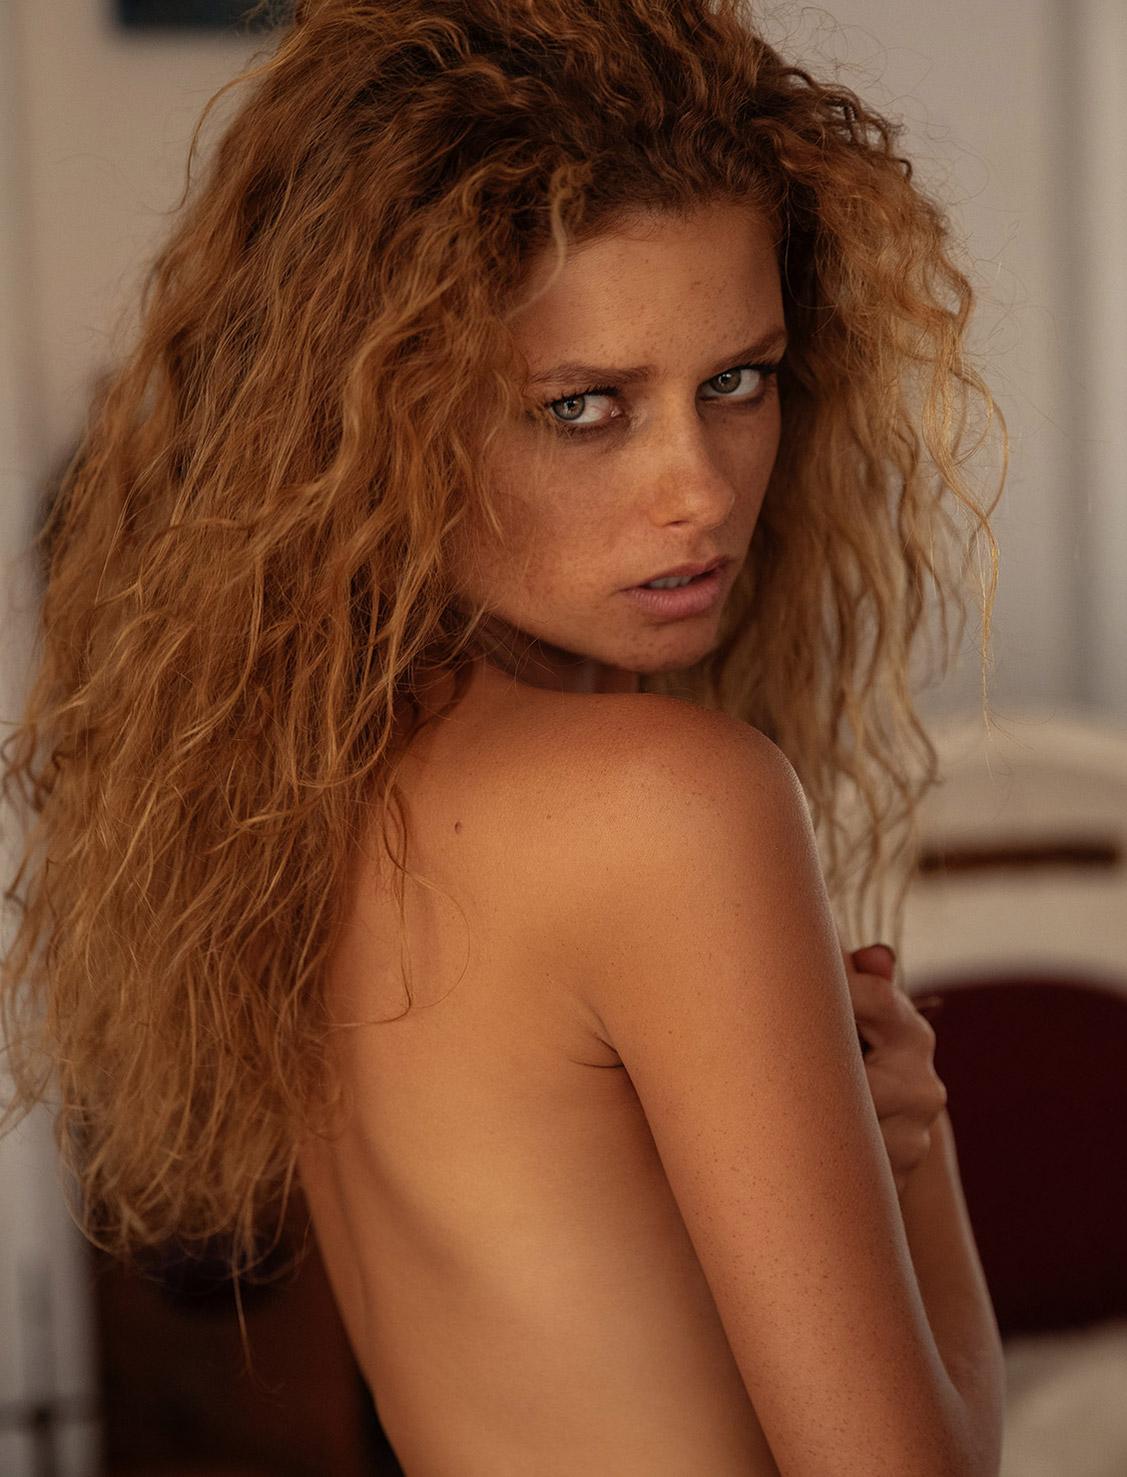 Loungin - Julia Yaroshenko / Юлия Ярошенко, фотограф Paul McMahon - Yume Magazine